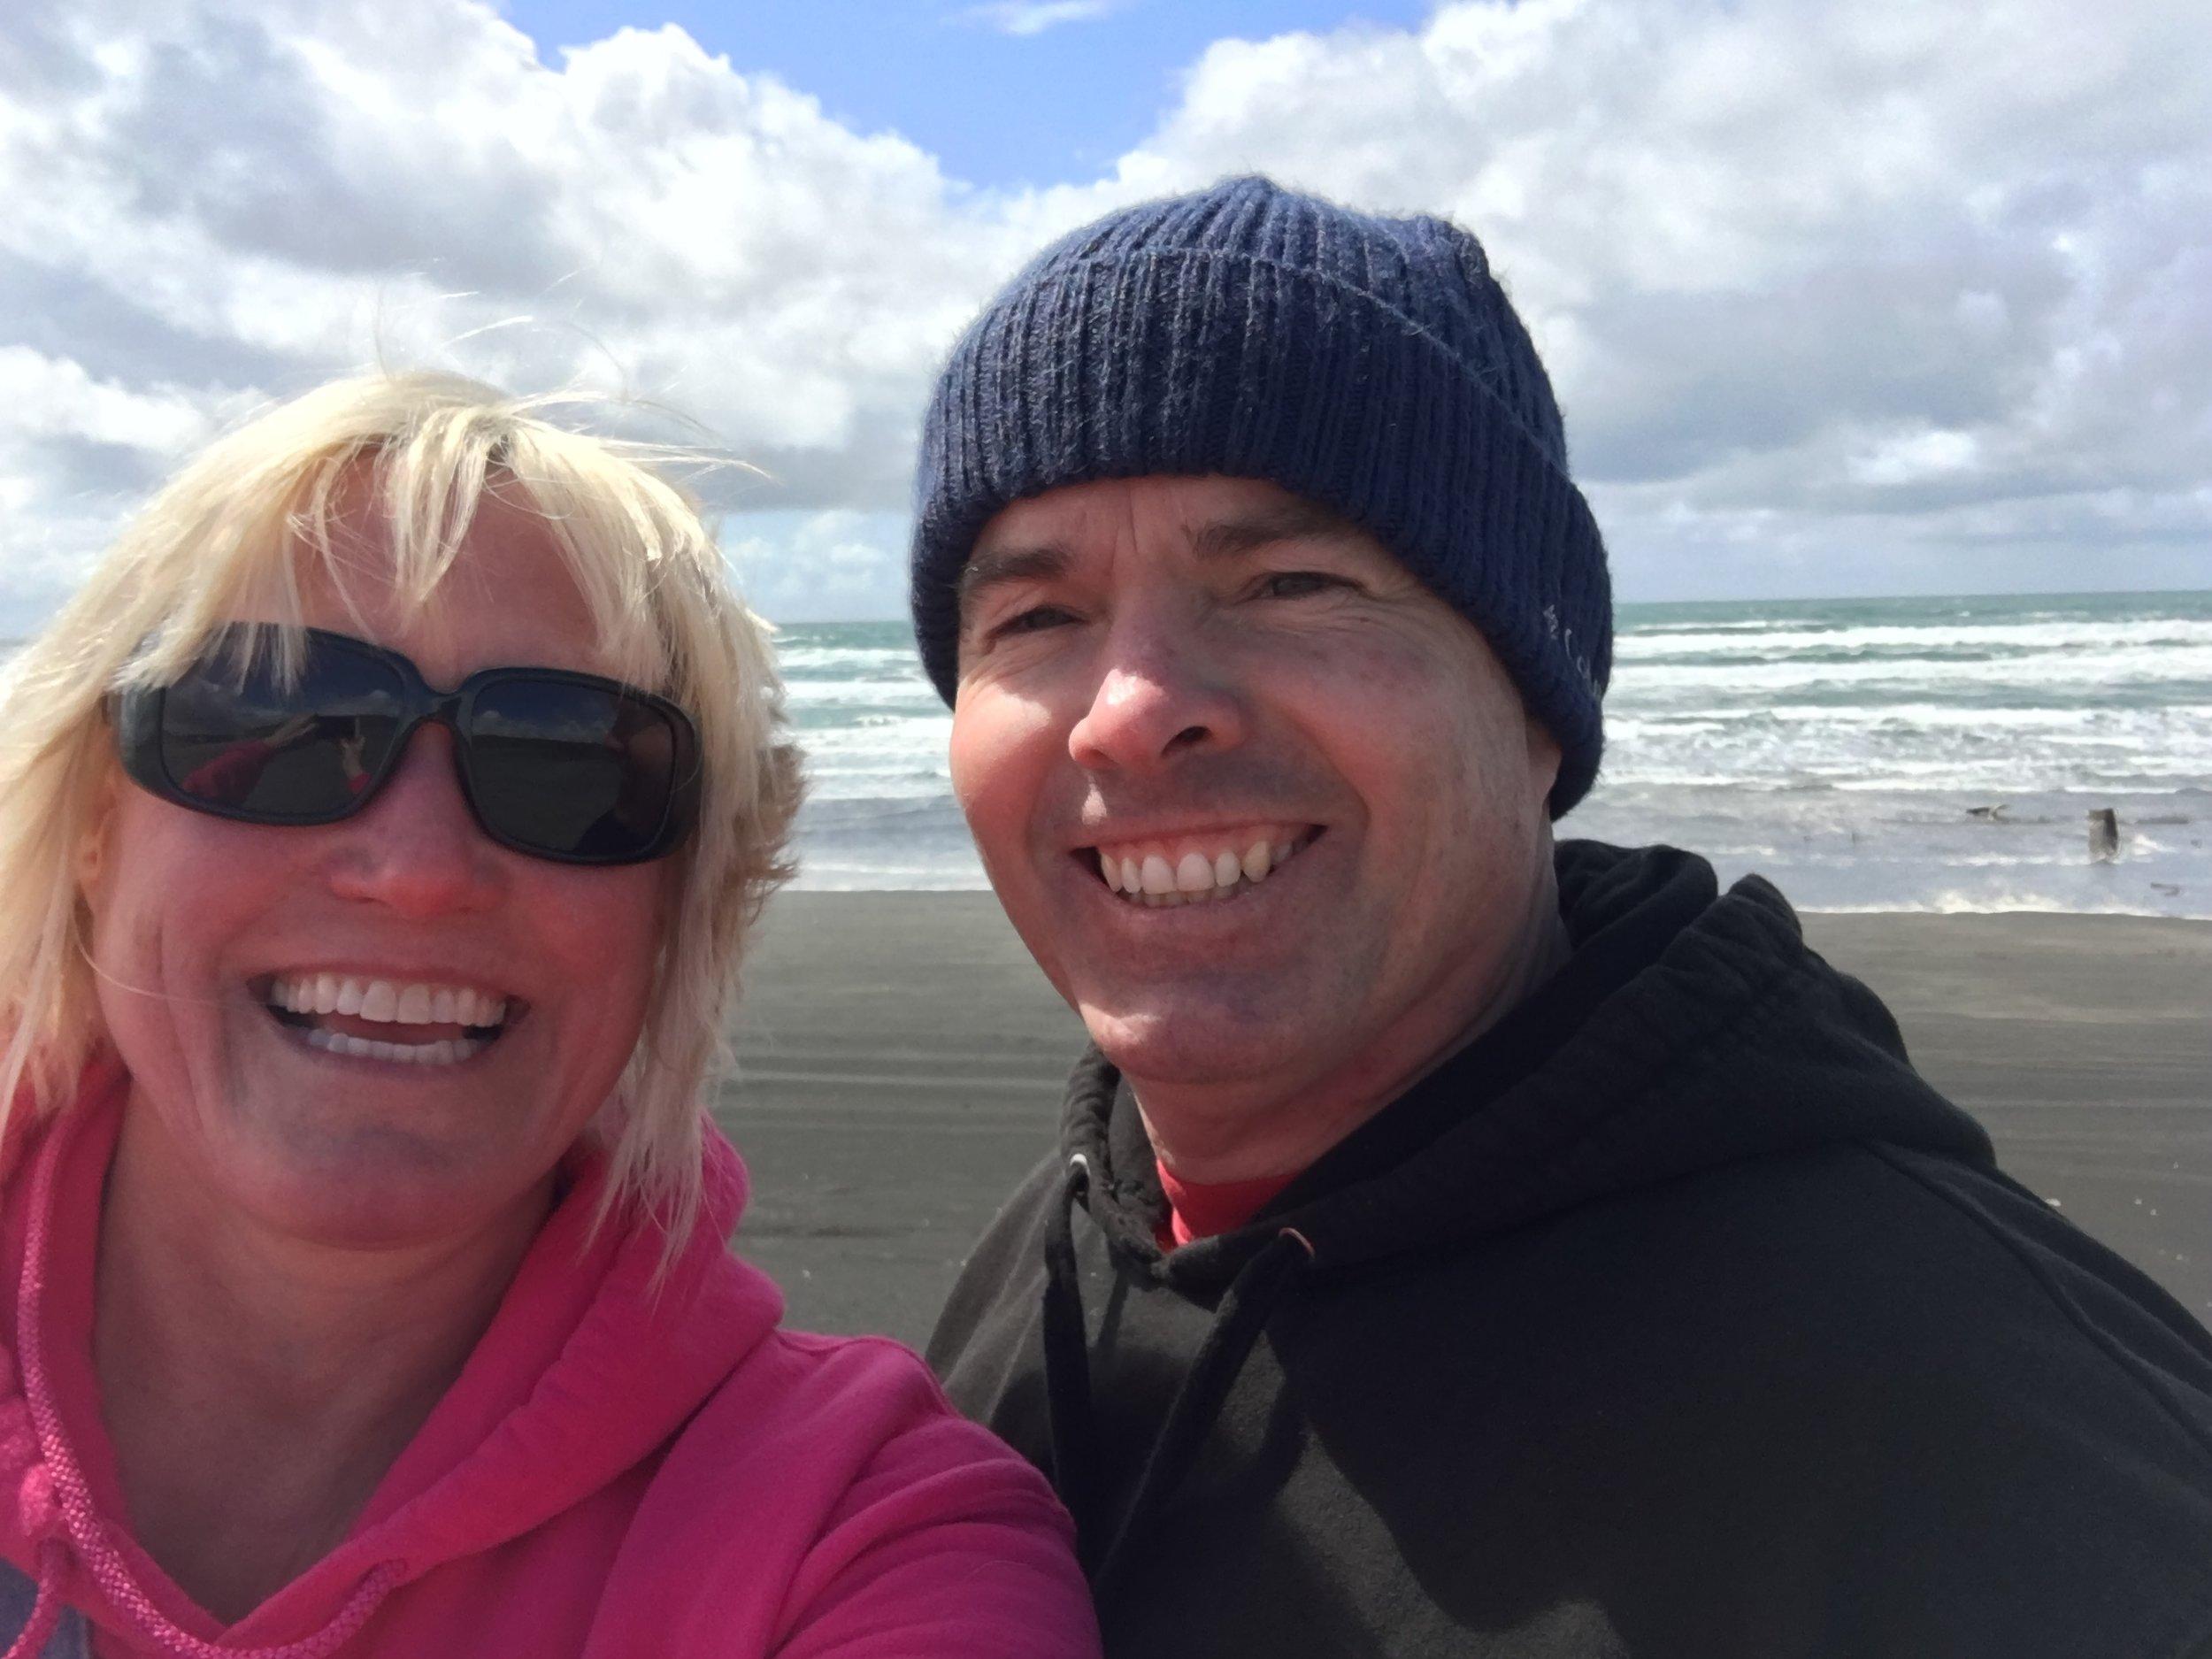 Beach selfie at Shipwreck Beach, Fort Stevens State Park.